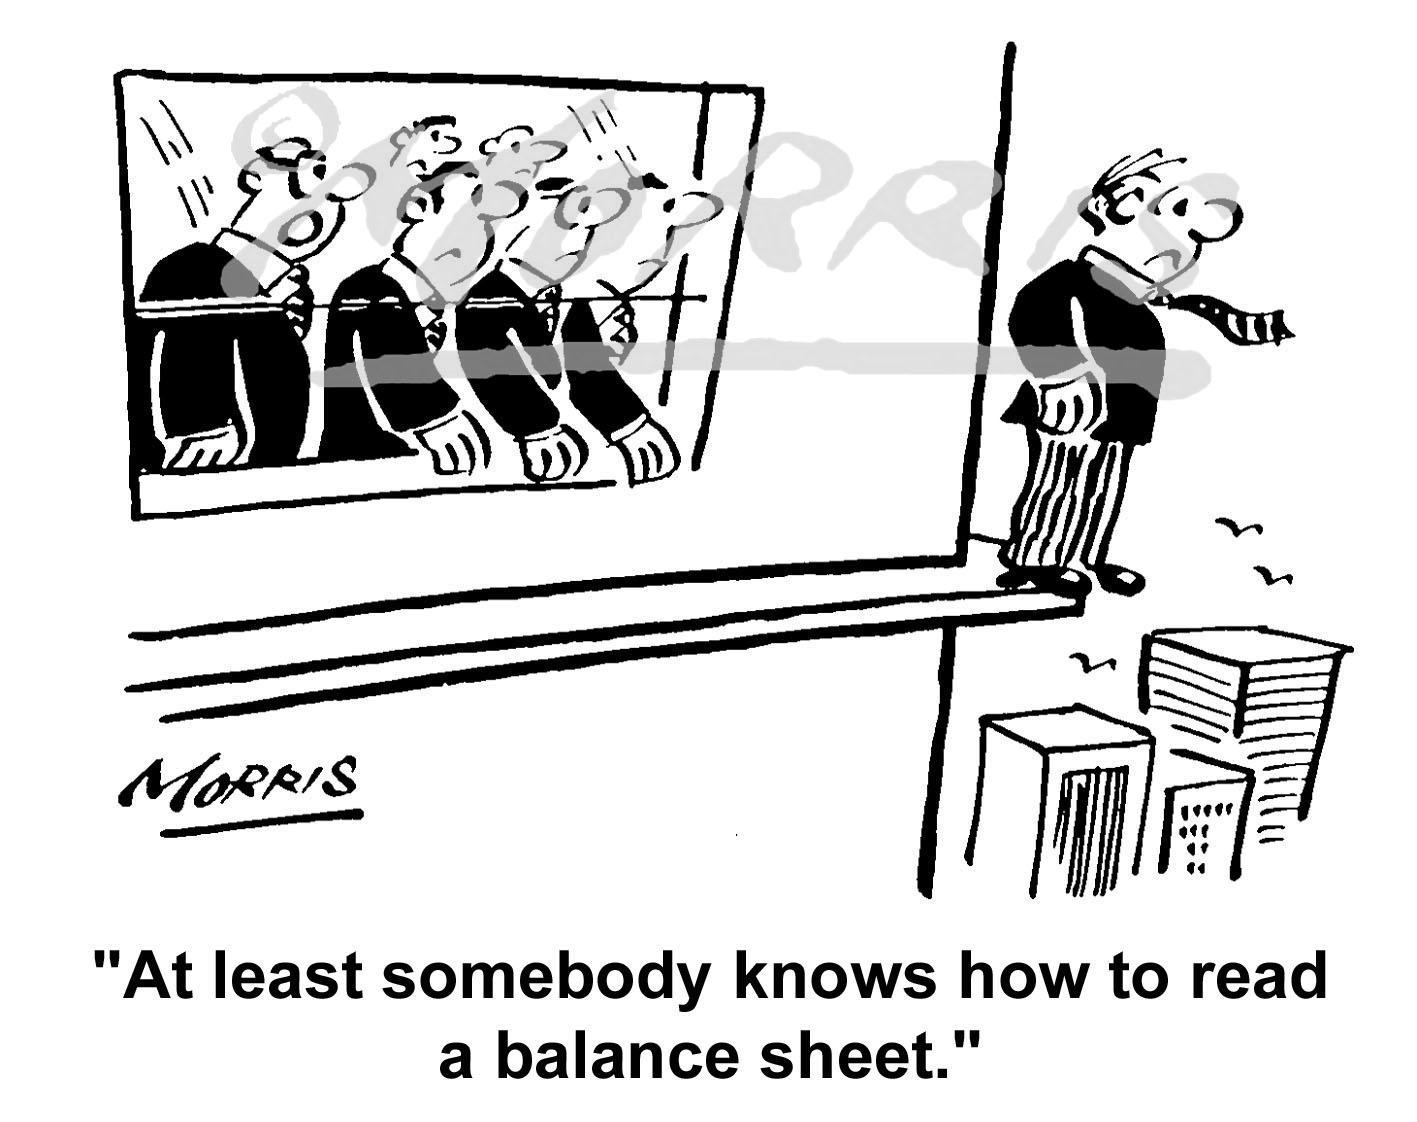 Company balance sheet cartoon Ref: 1632bw